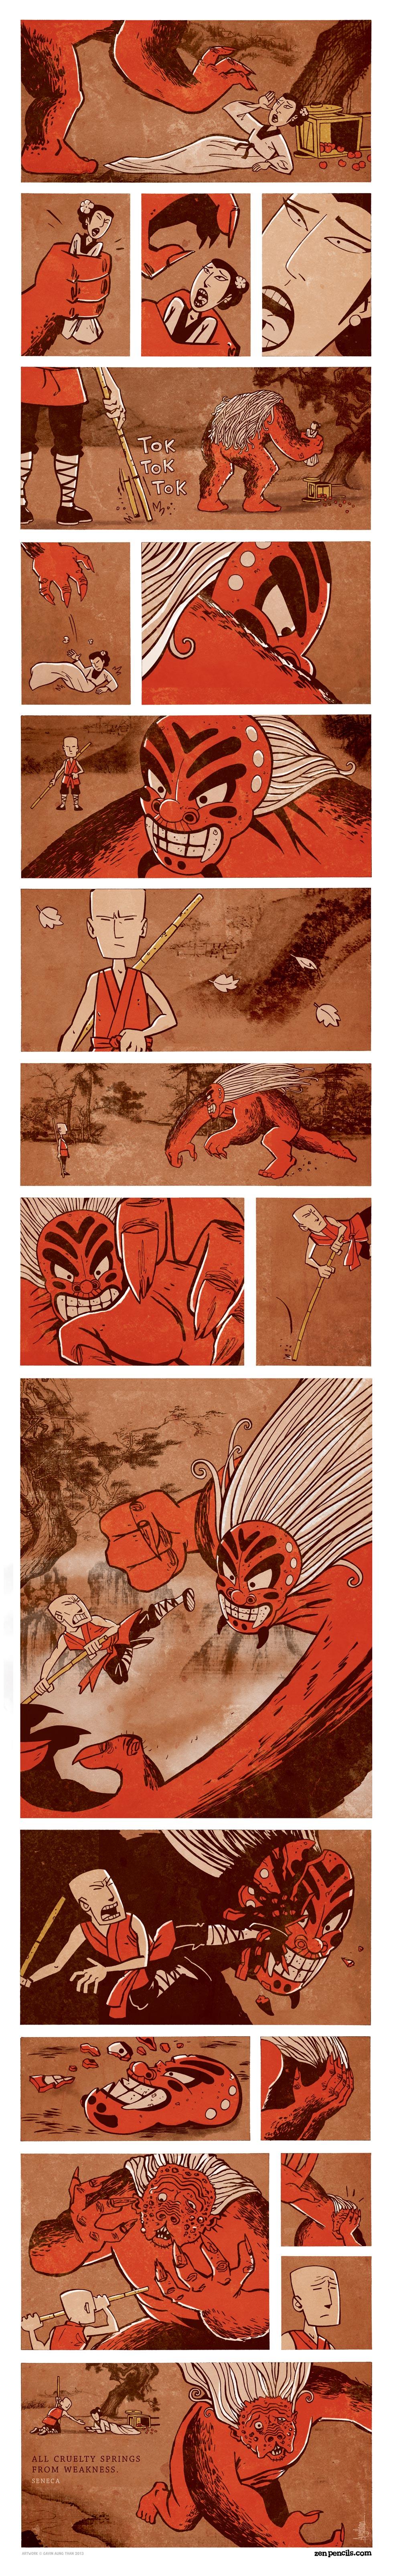 zen-illustrations-seneca